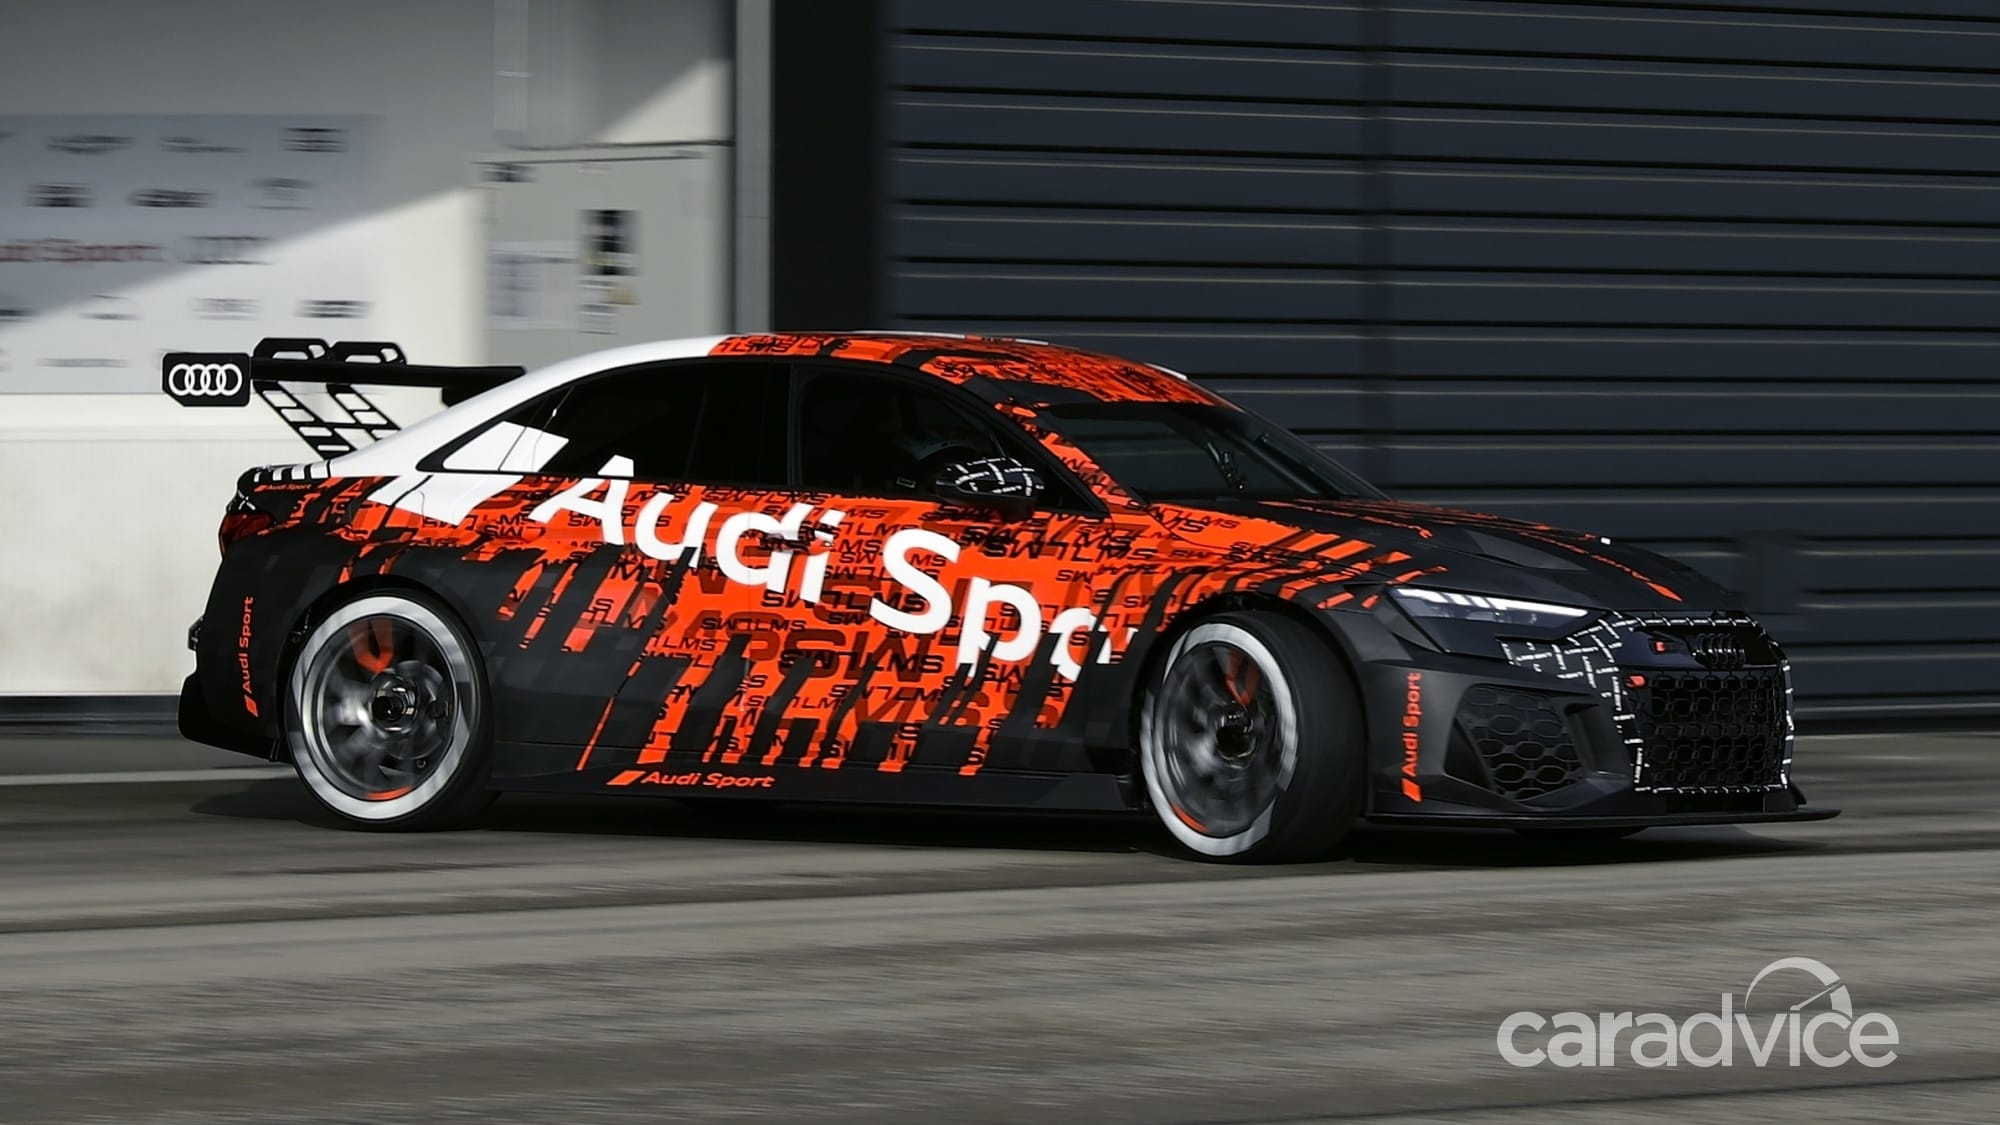 2021 Audi RS3 LMS racer revealed, previews next-gen RS3 ...